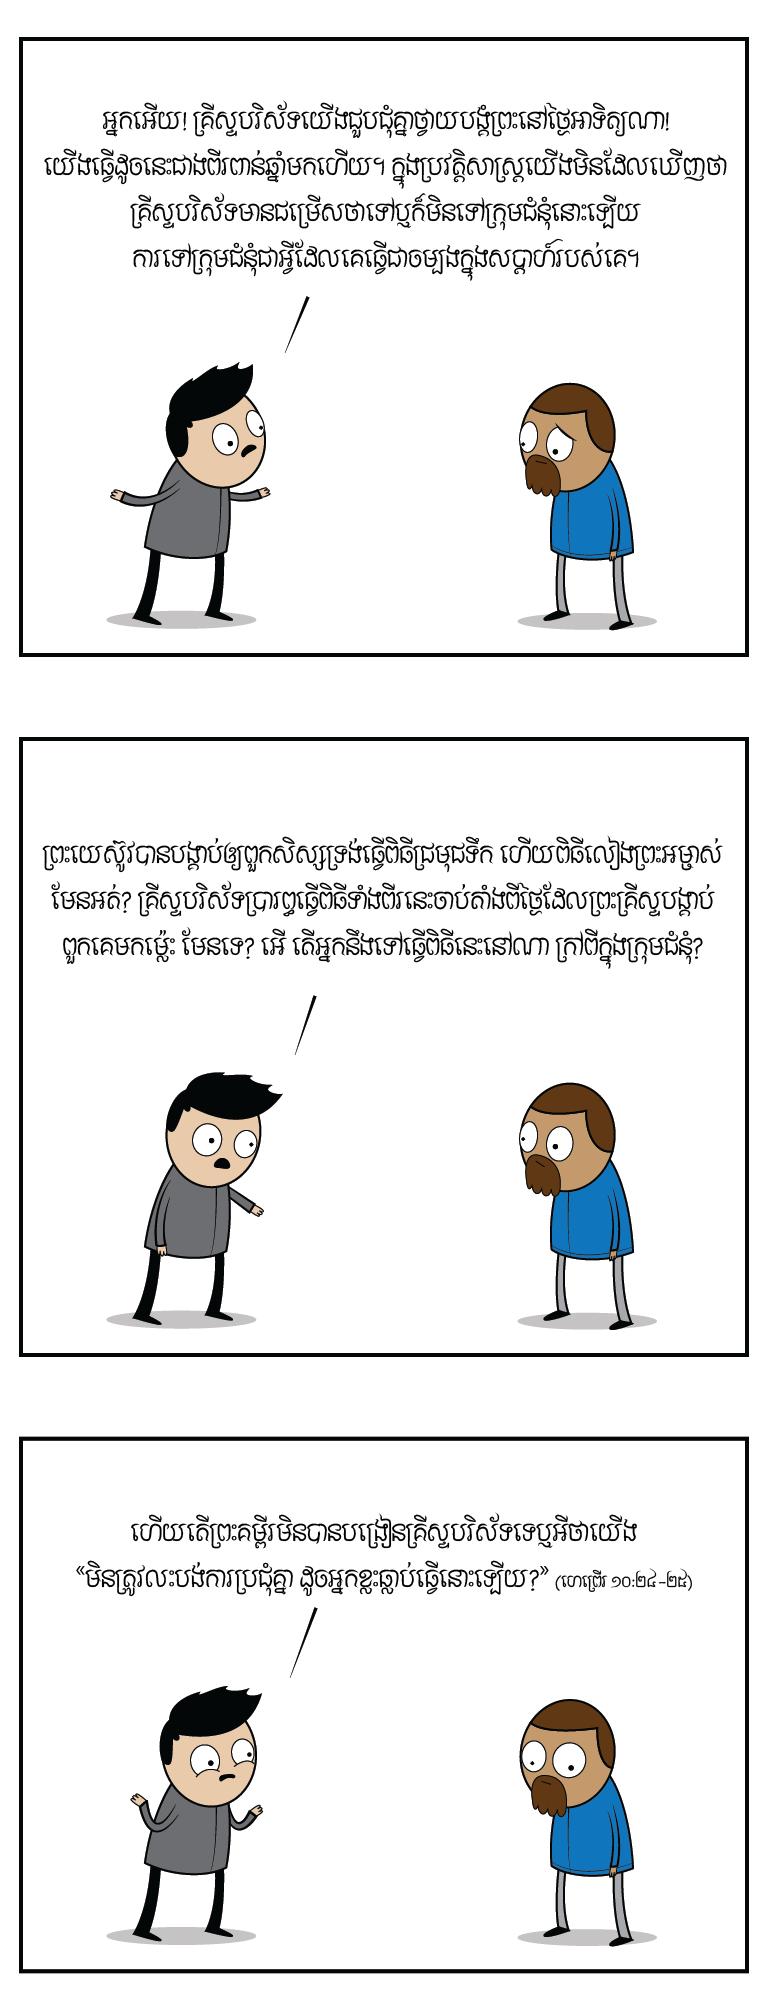 2015-03-03-sleep-in2-khmer2-2